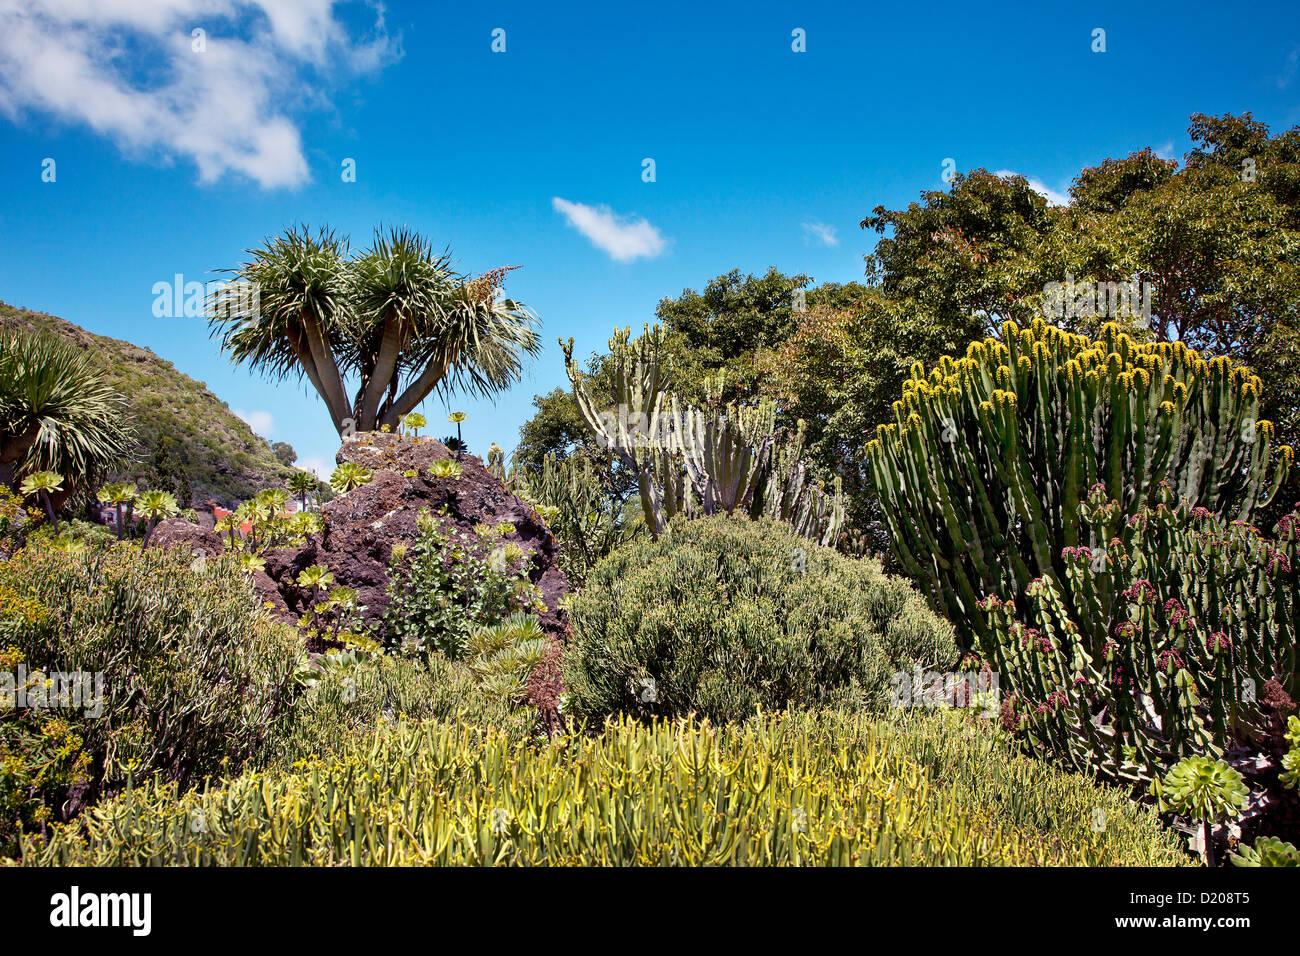 Jardin Canario, Tafira, Gran Canaria, Canary Islands, Spain - Stock Image